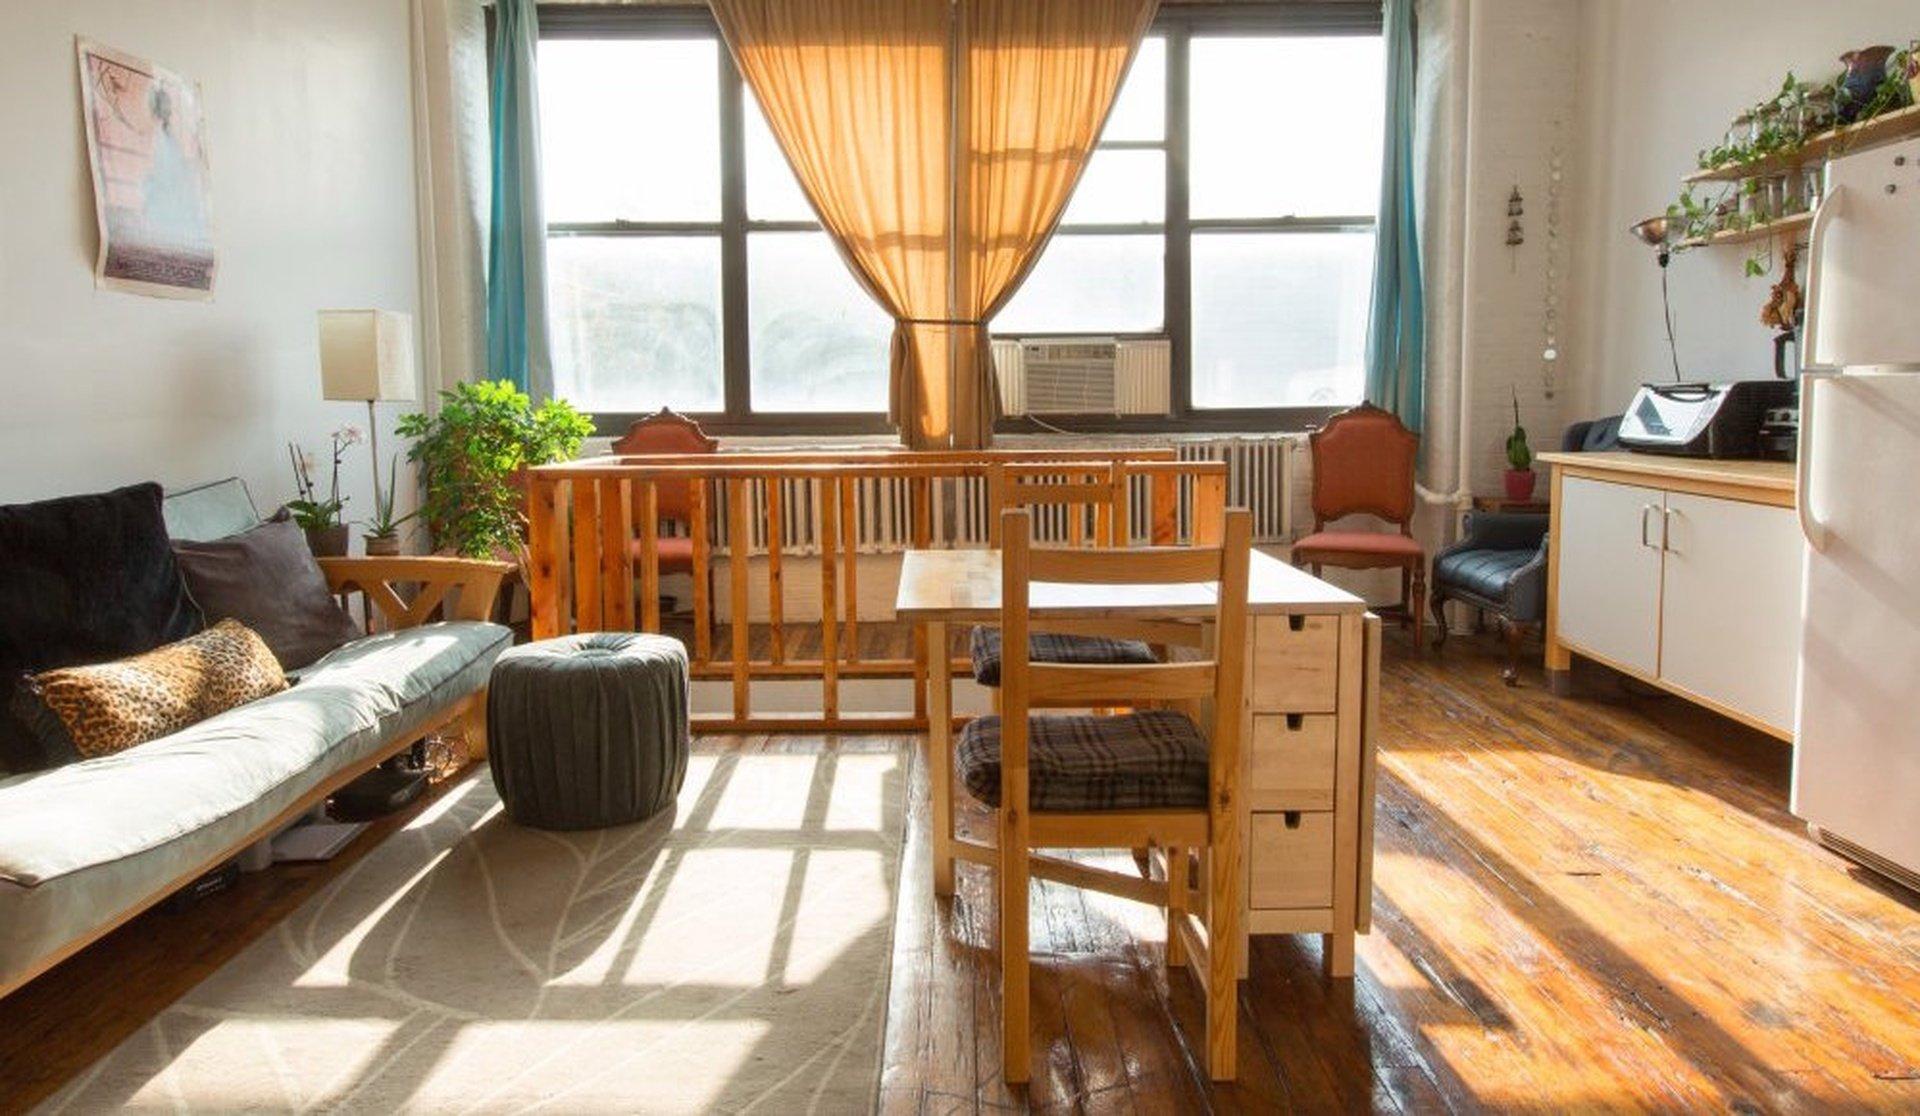 NYC workshop spaces Private residence Brooklyn 2 Story Loft: Bright upstairs, Dark downstairs, Rooftop image 0